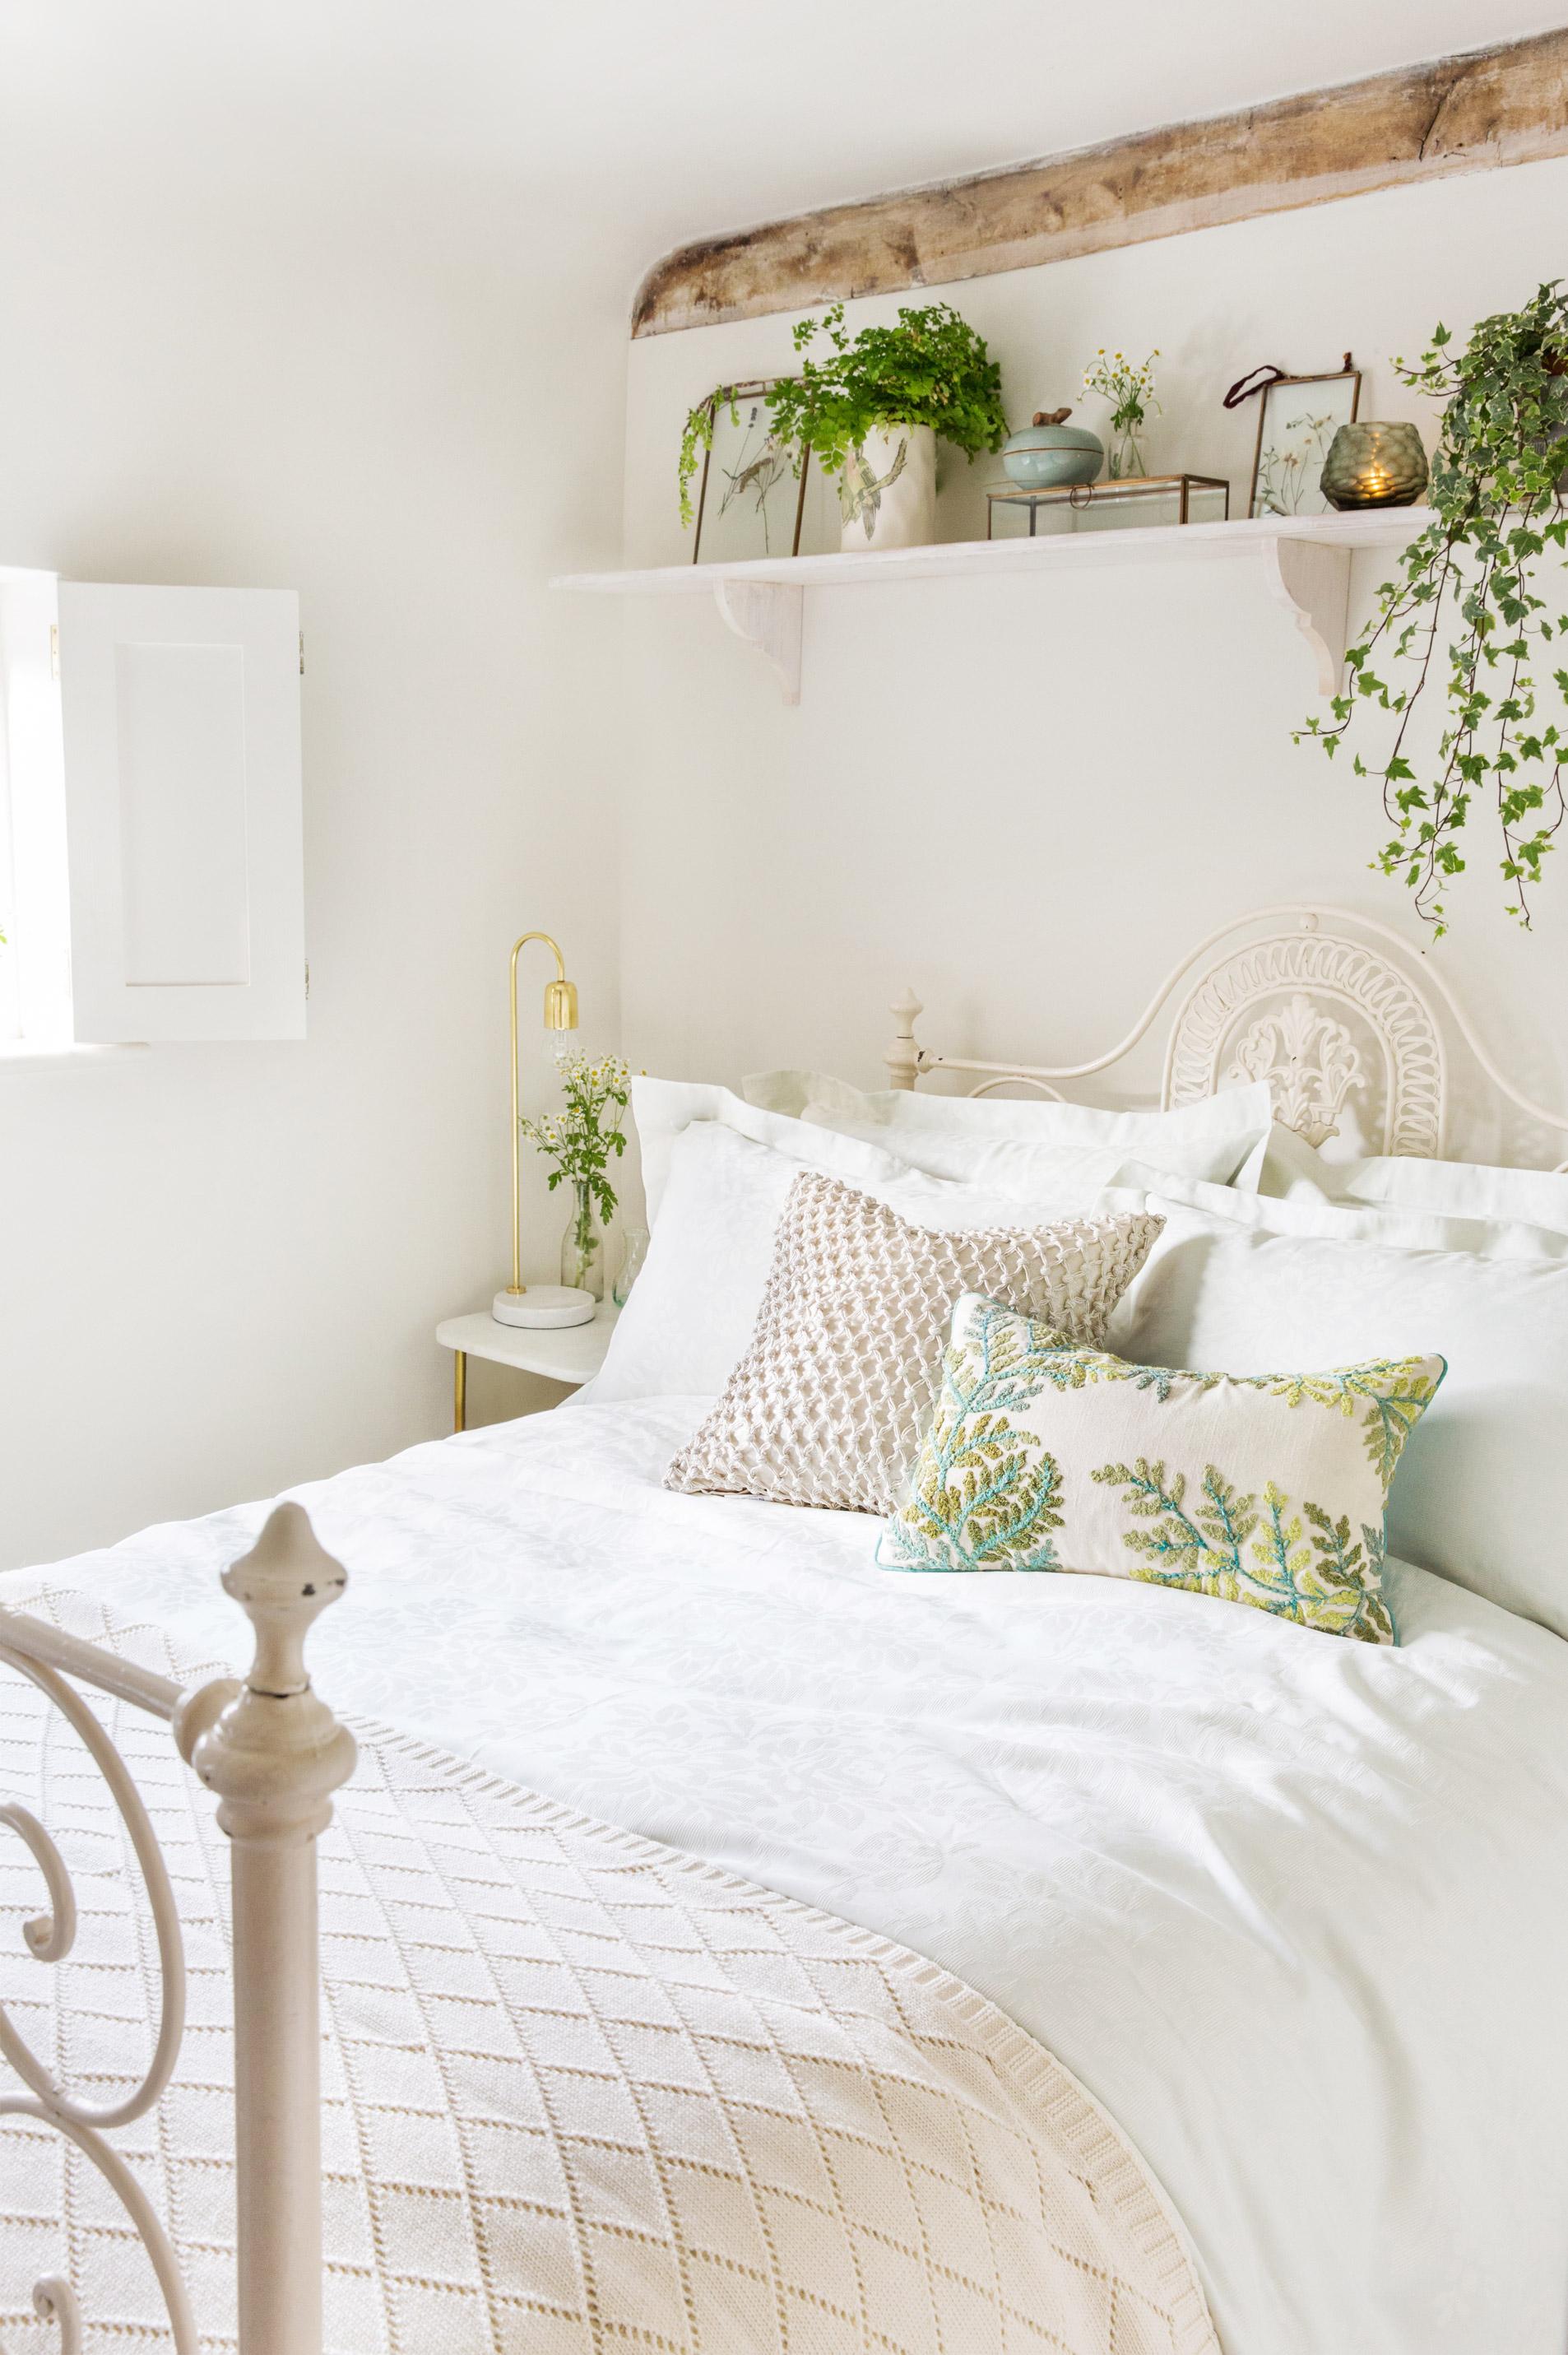 Bedroom Decor Ideas Elena Jackson Bedroom Decor Ideas VHHROLC